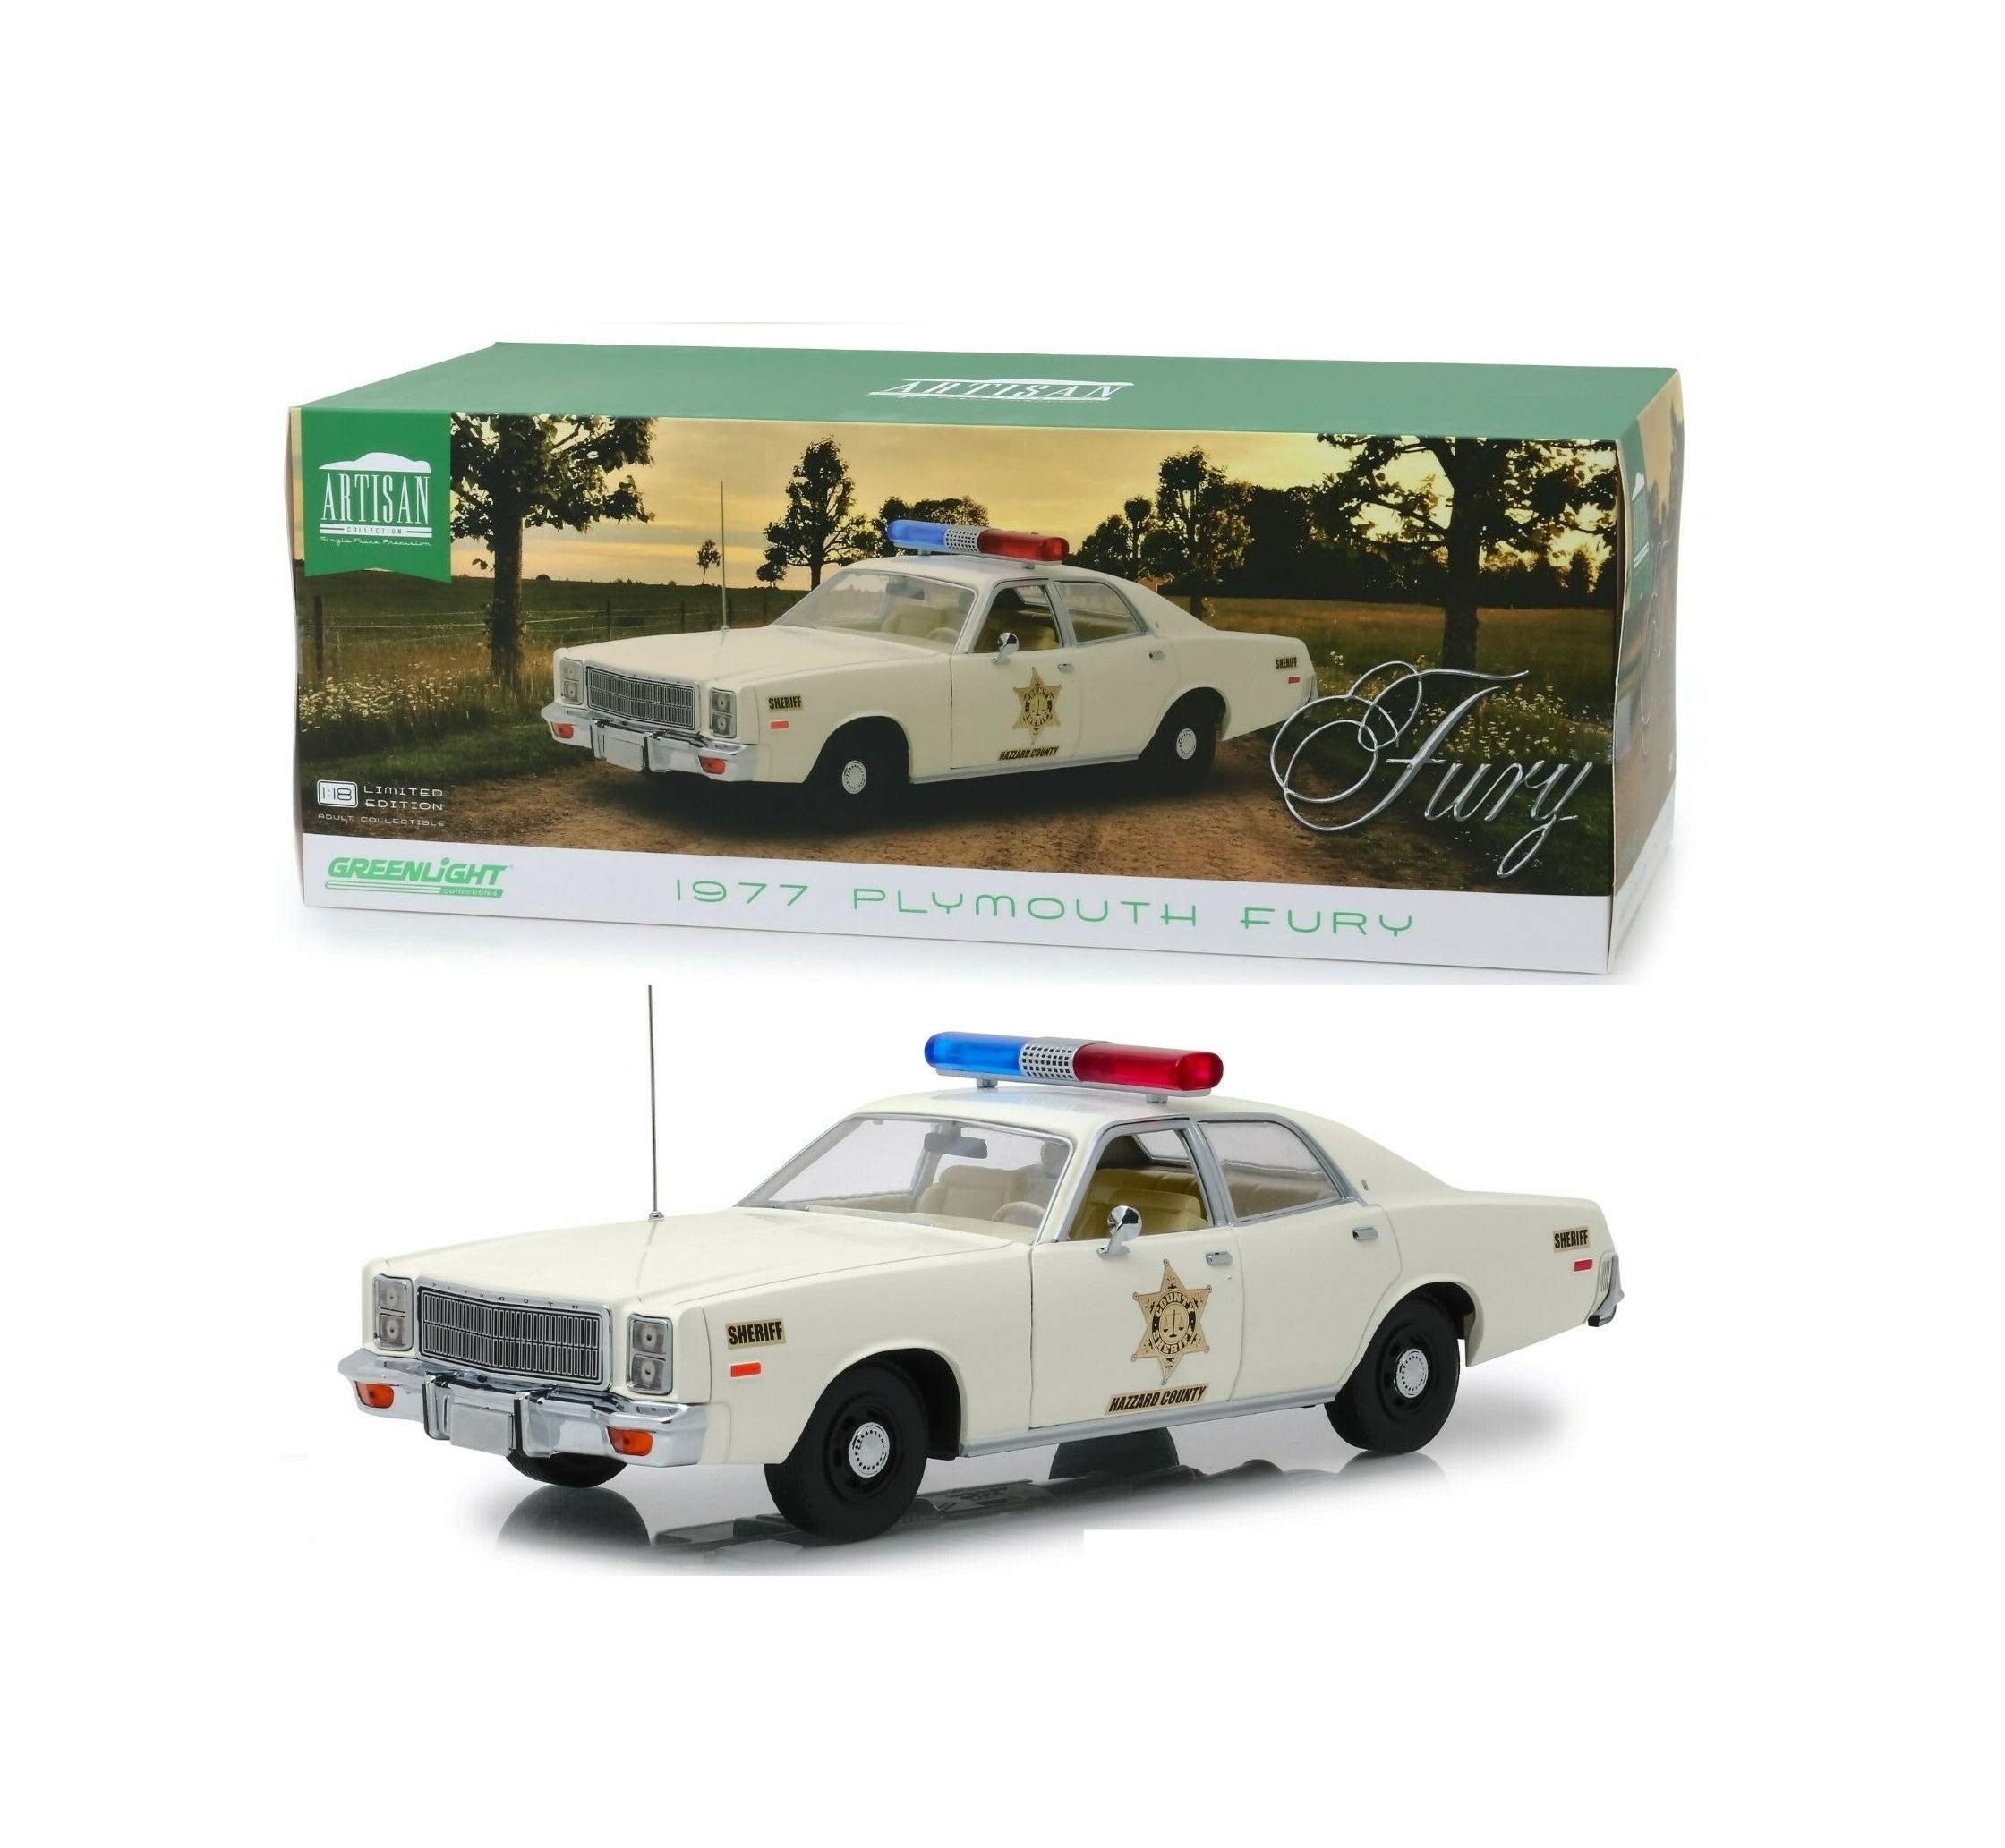 1:18 Love GiftDUKES of Hazard County Sheriff Roscoe's 1977 PlymouthNIB Rare Diecast Vehicle